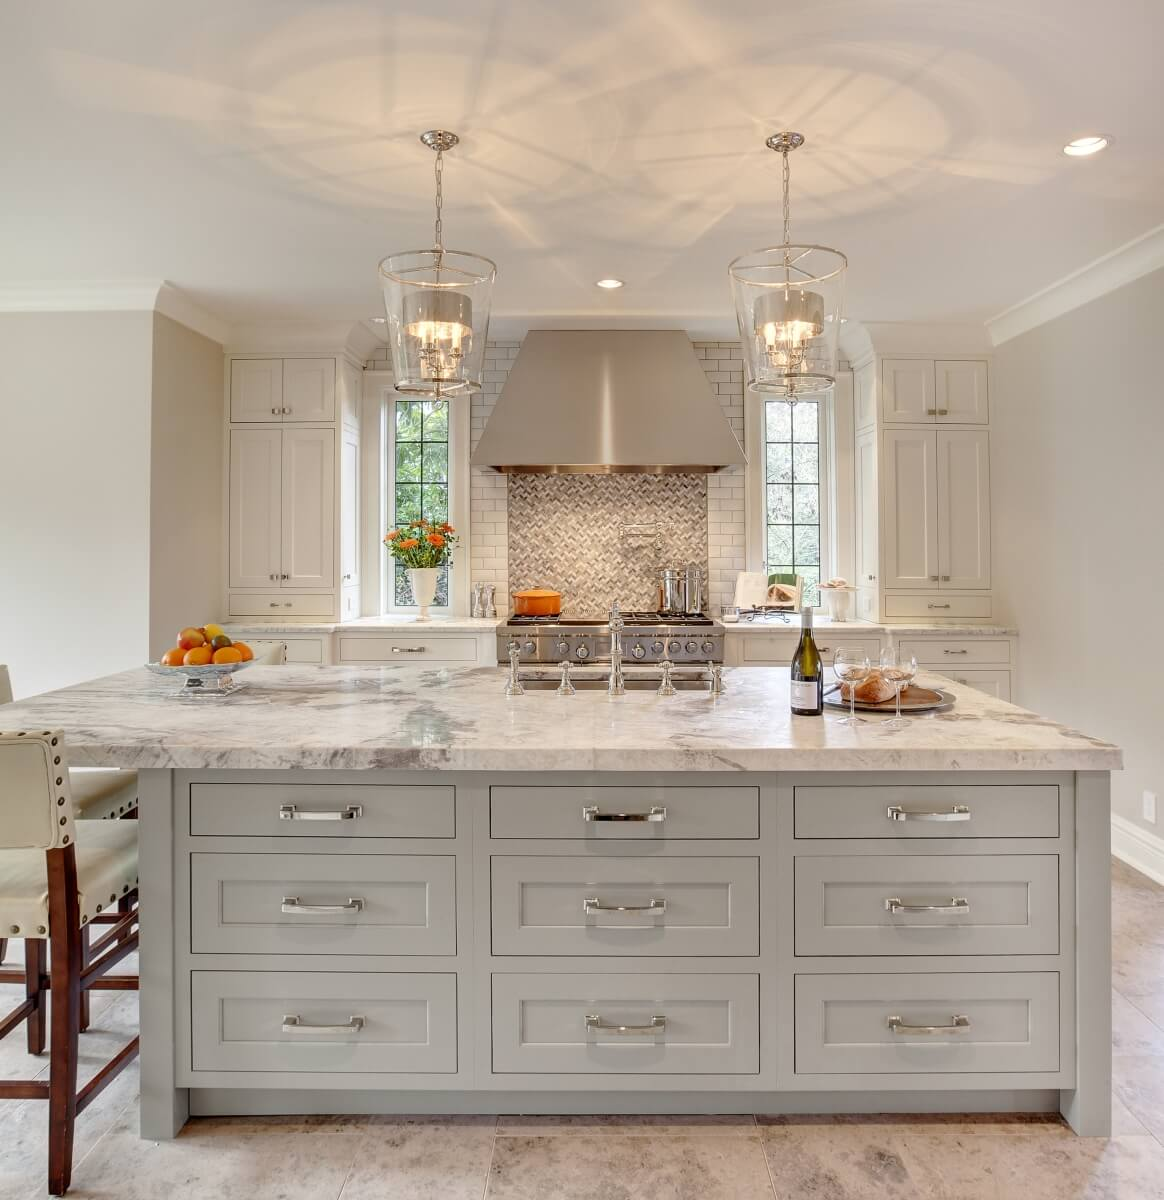 Kitchen Design By Beverly Bradshaw Interiors, Washington. Photography by Tom Marks Photo. Cabinetry by Collaborative Interiors, Washington.